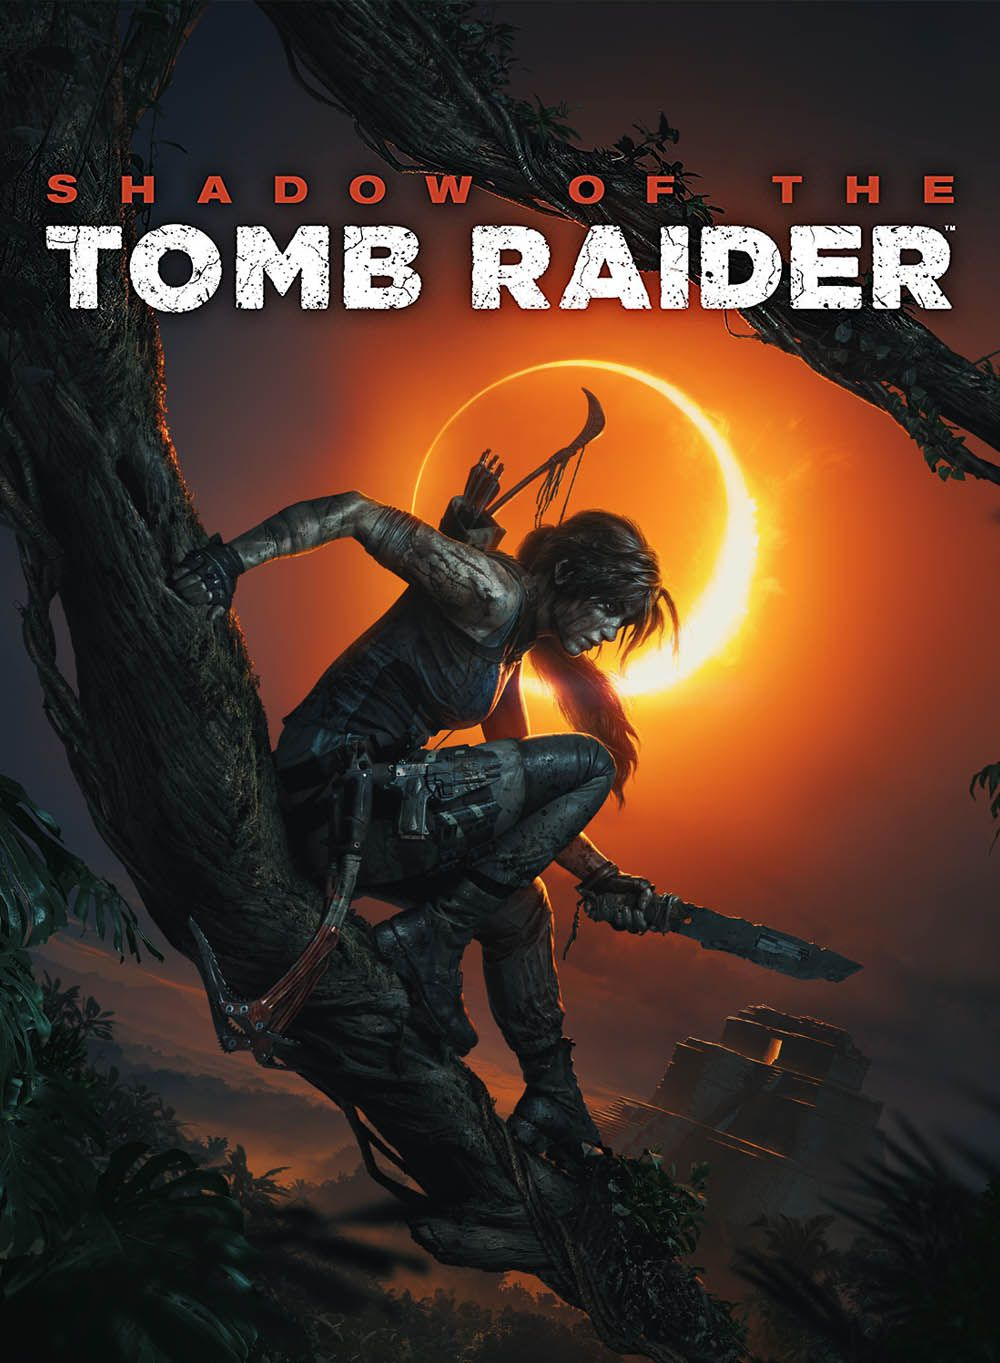 Tomb Raider 2018 Streaming Vf : raider, streaming, Telecharger, Raider, (2013), Vidéo, Français